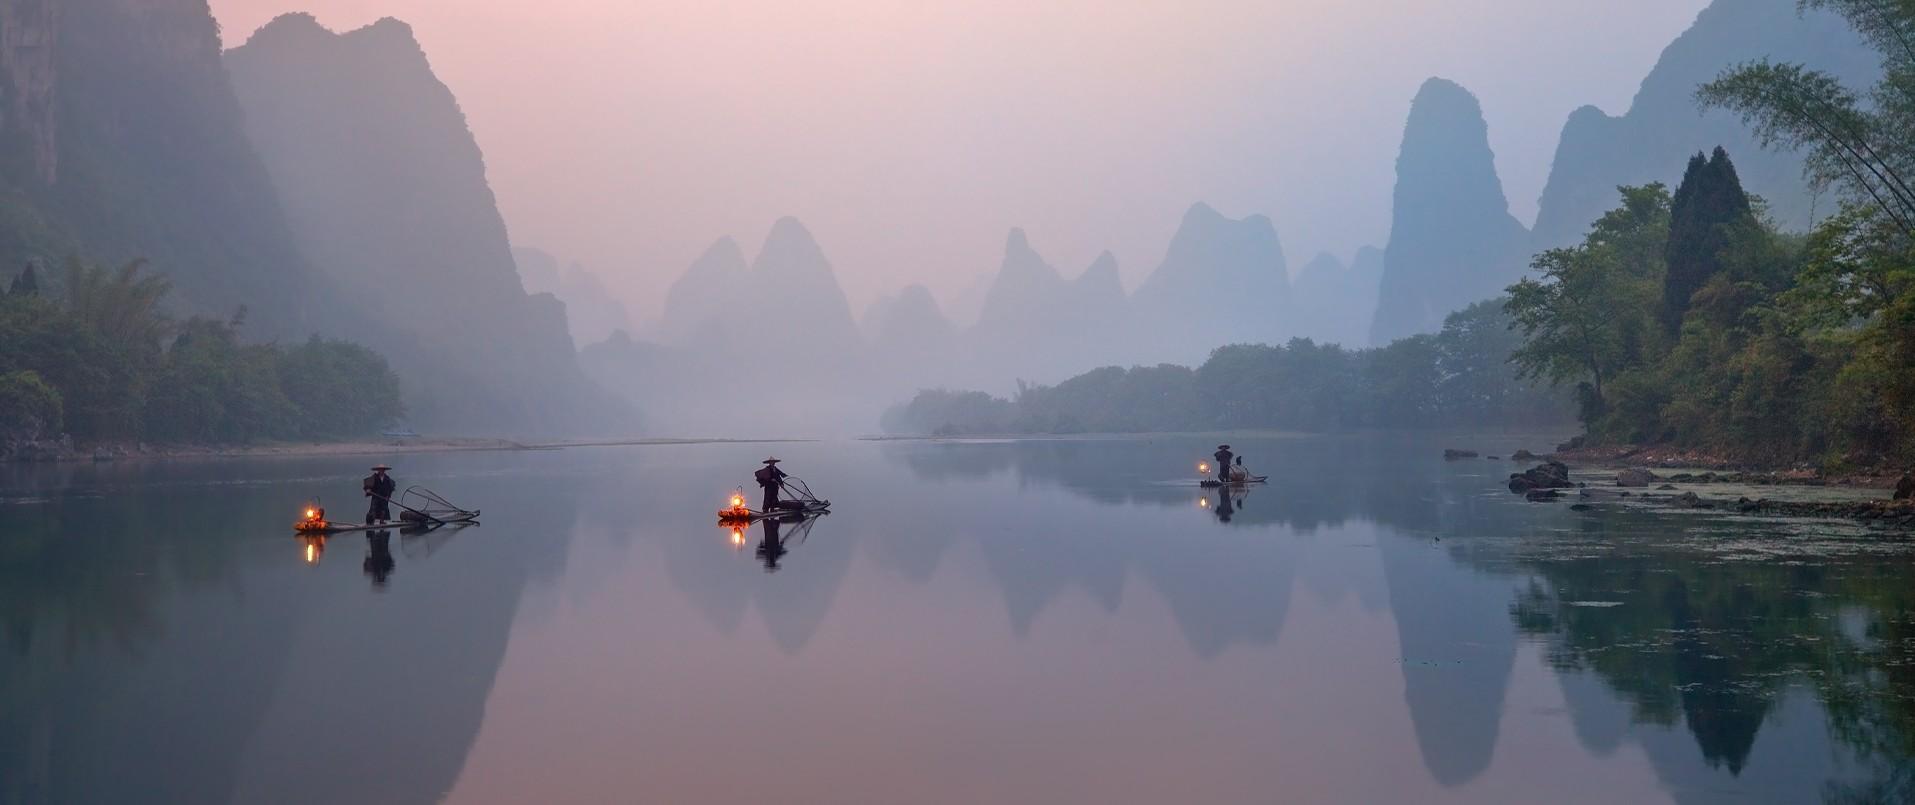 Metis Wisdom Dr Janeta Tansey river mountains fog